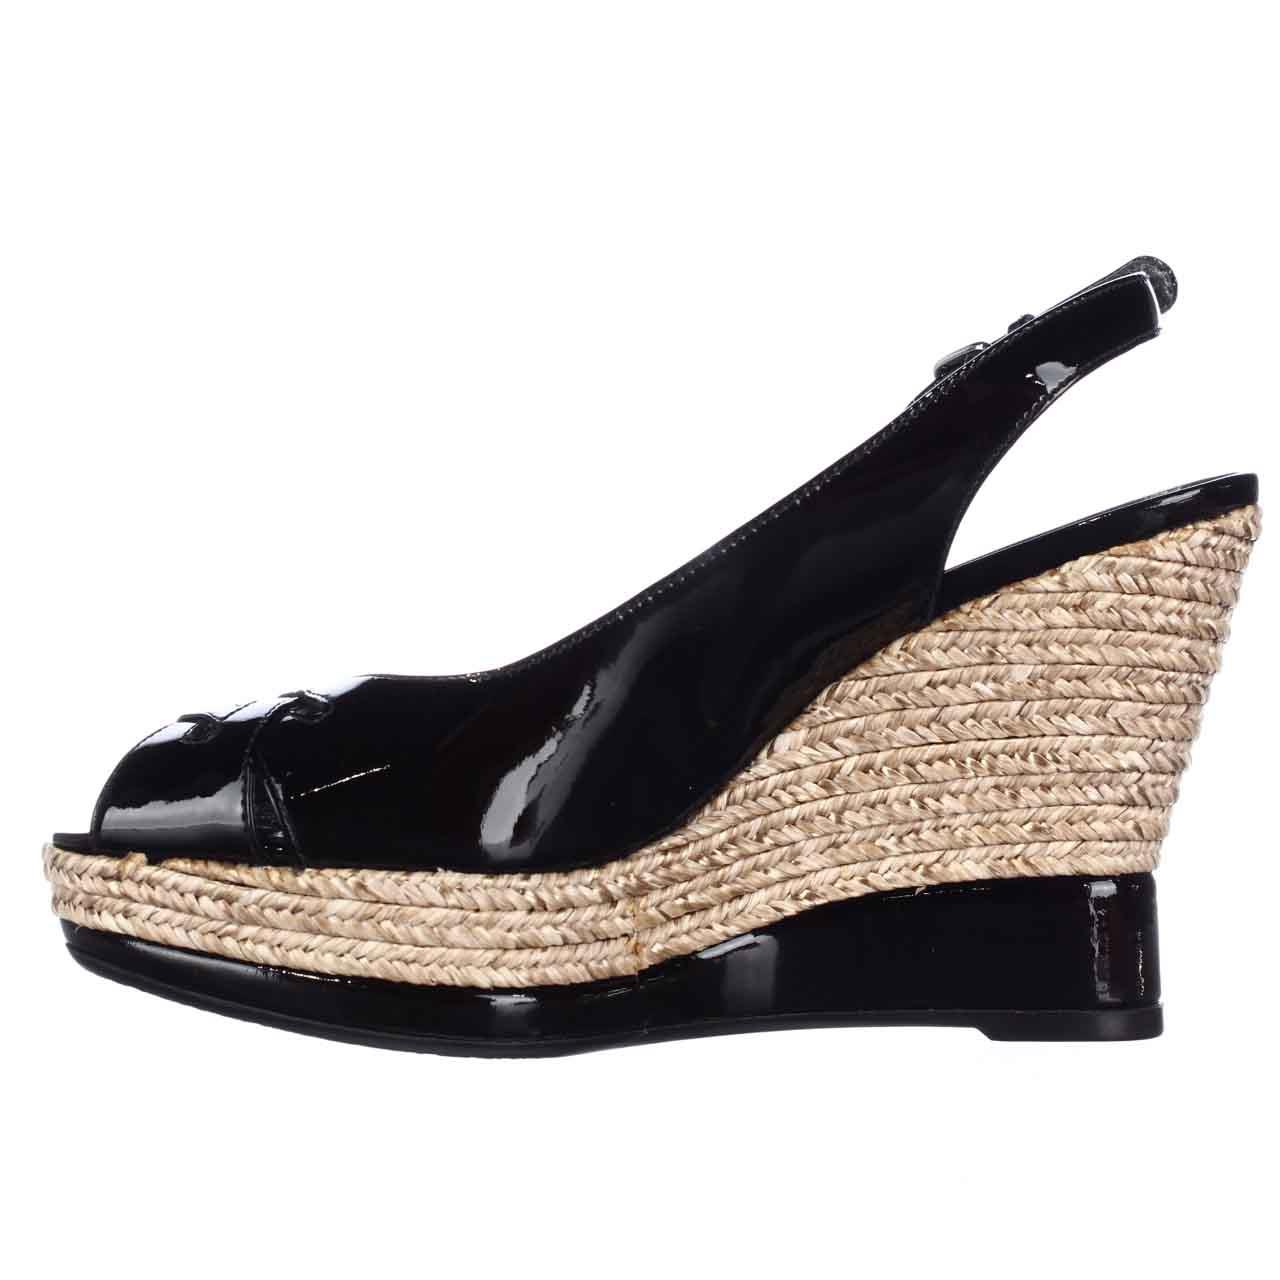 fc1c11f4977 Womens Stuart Weitzman Dolunch Espadrille Wedge Platform Slingback Sandals  - Black Patent